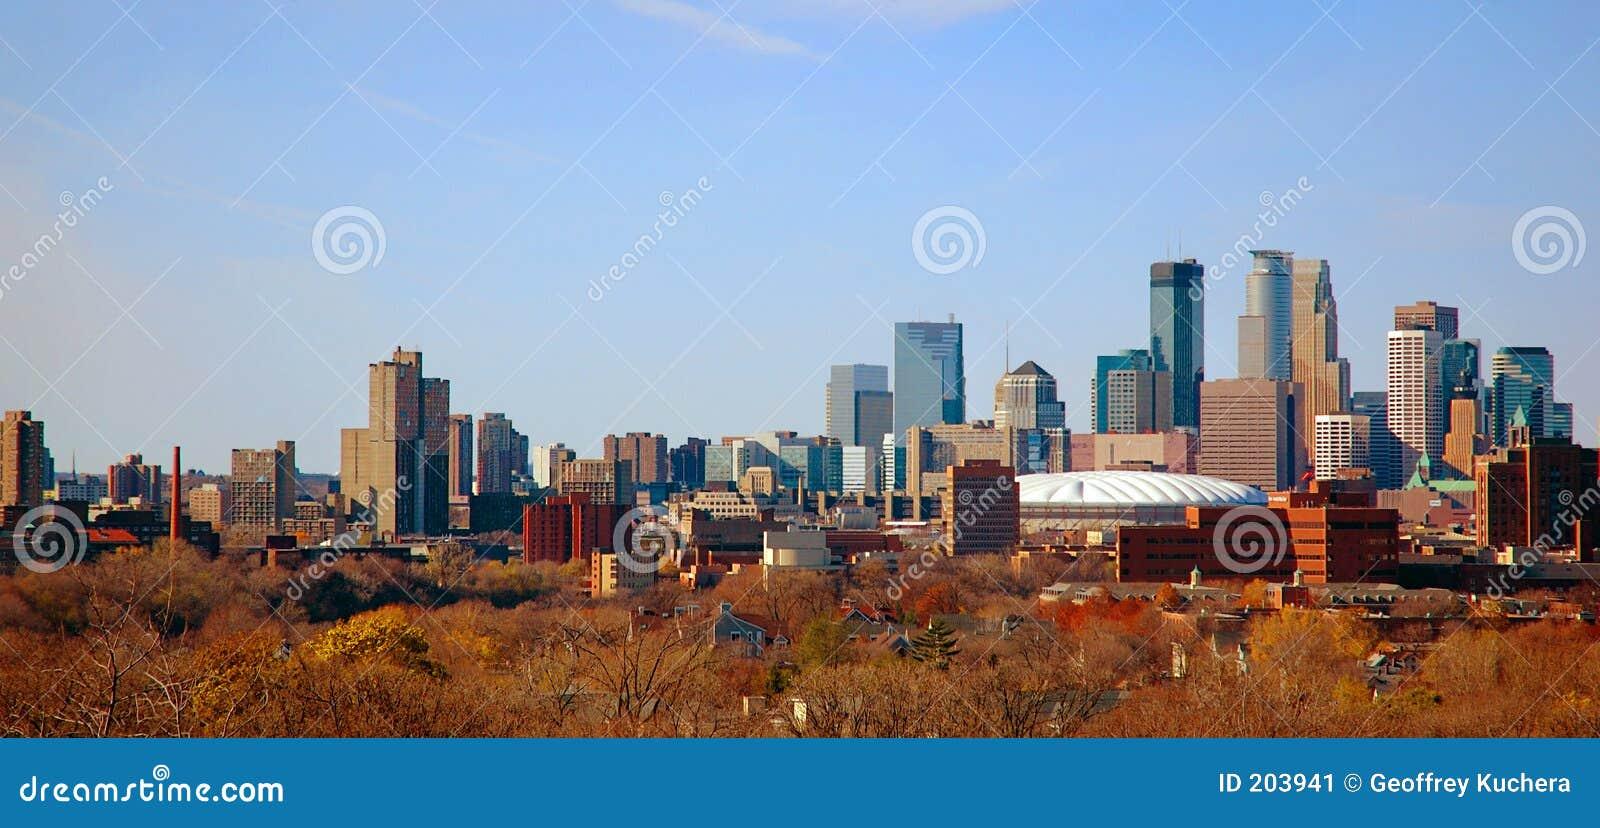 Herbst im Stadtzentrum gelegenes Minneapolis, Mangan